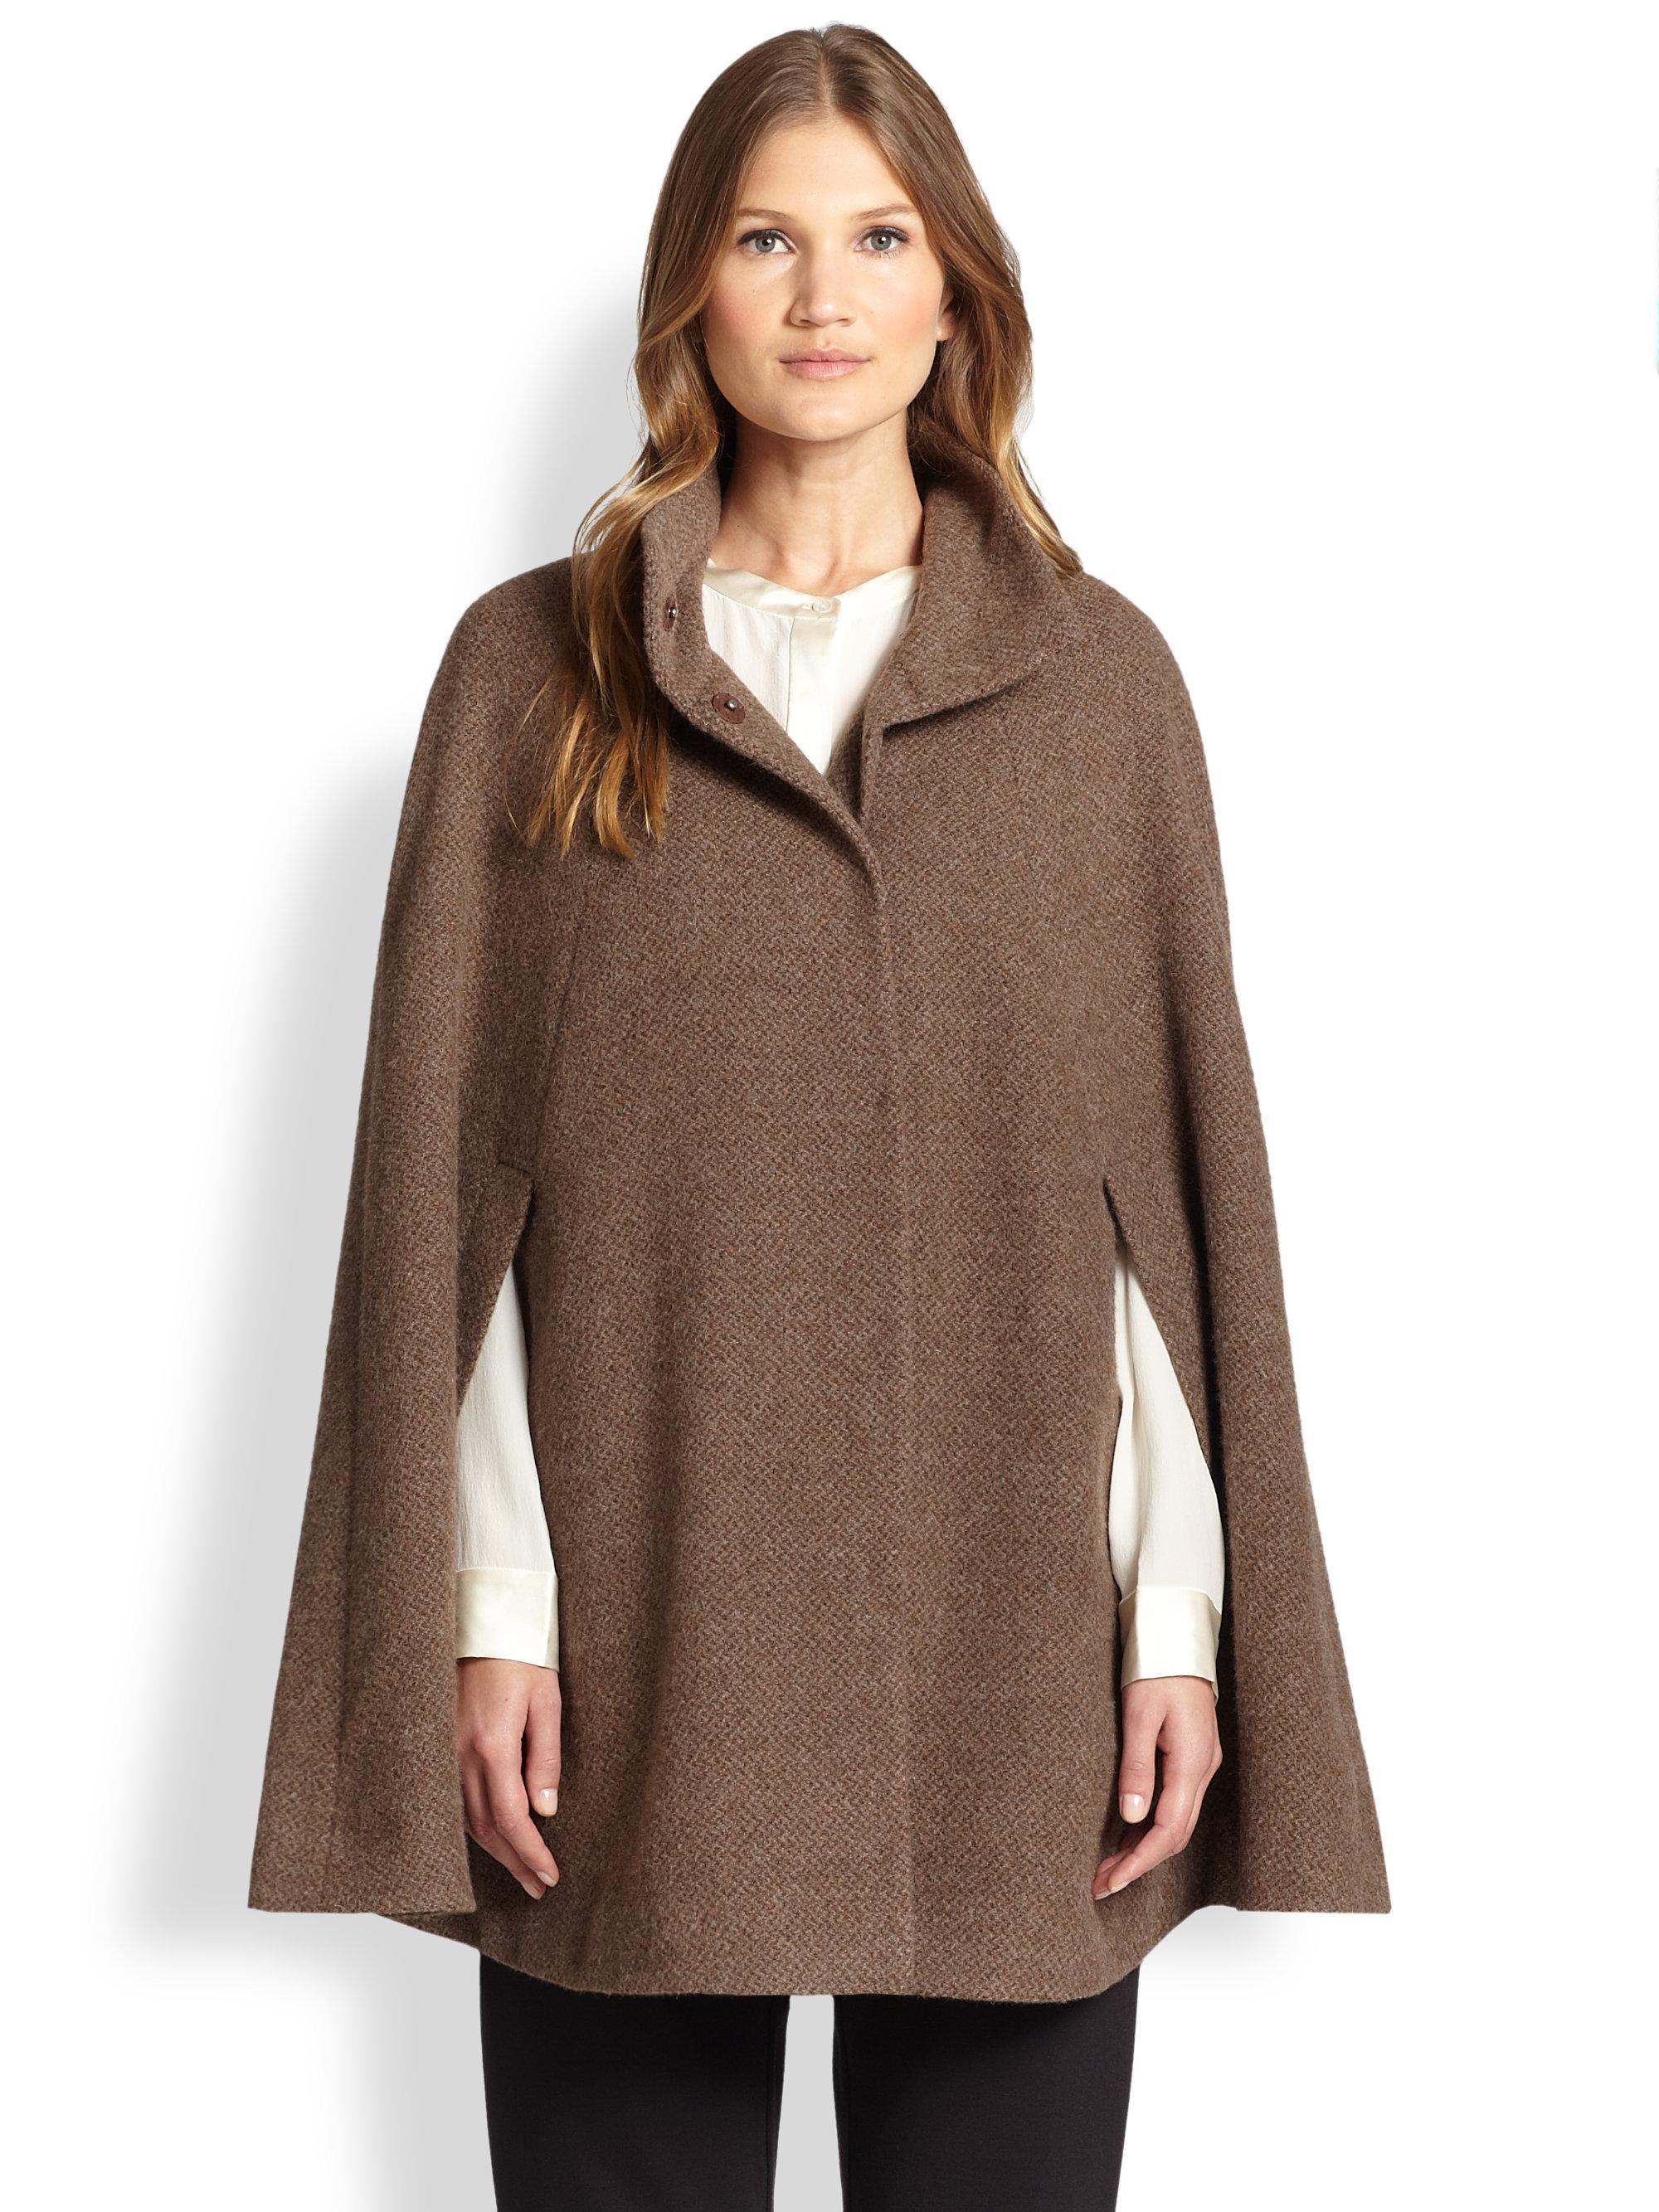 Eileen fisher Alpaca Tweed Cape in Brown | Lyst